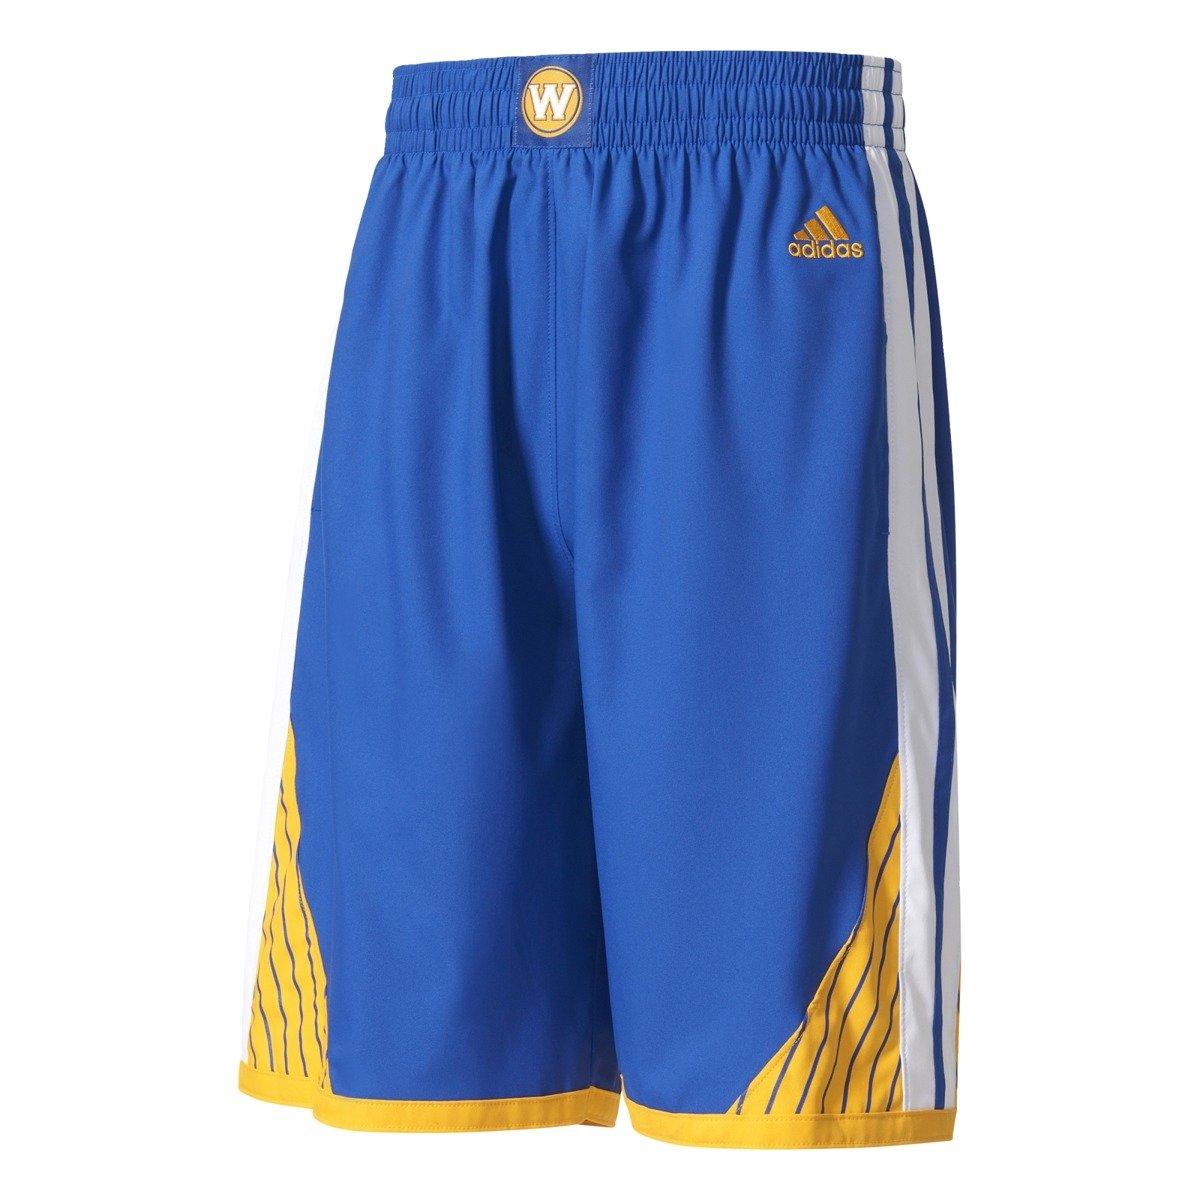 State shorts golden warriors